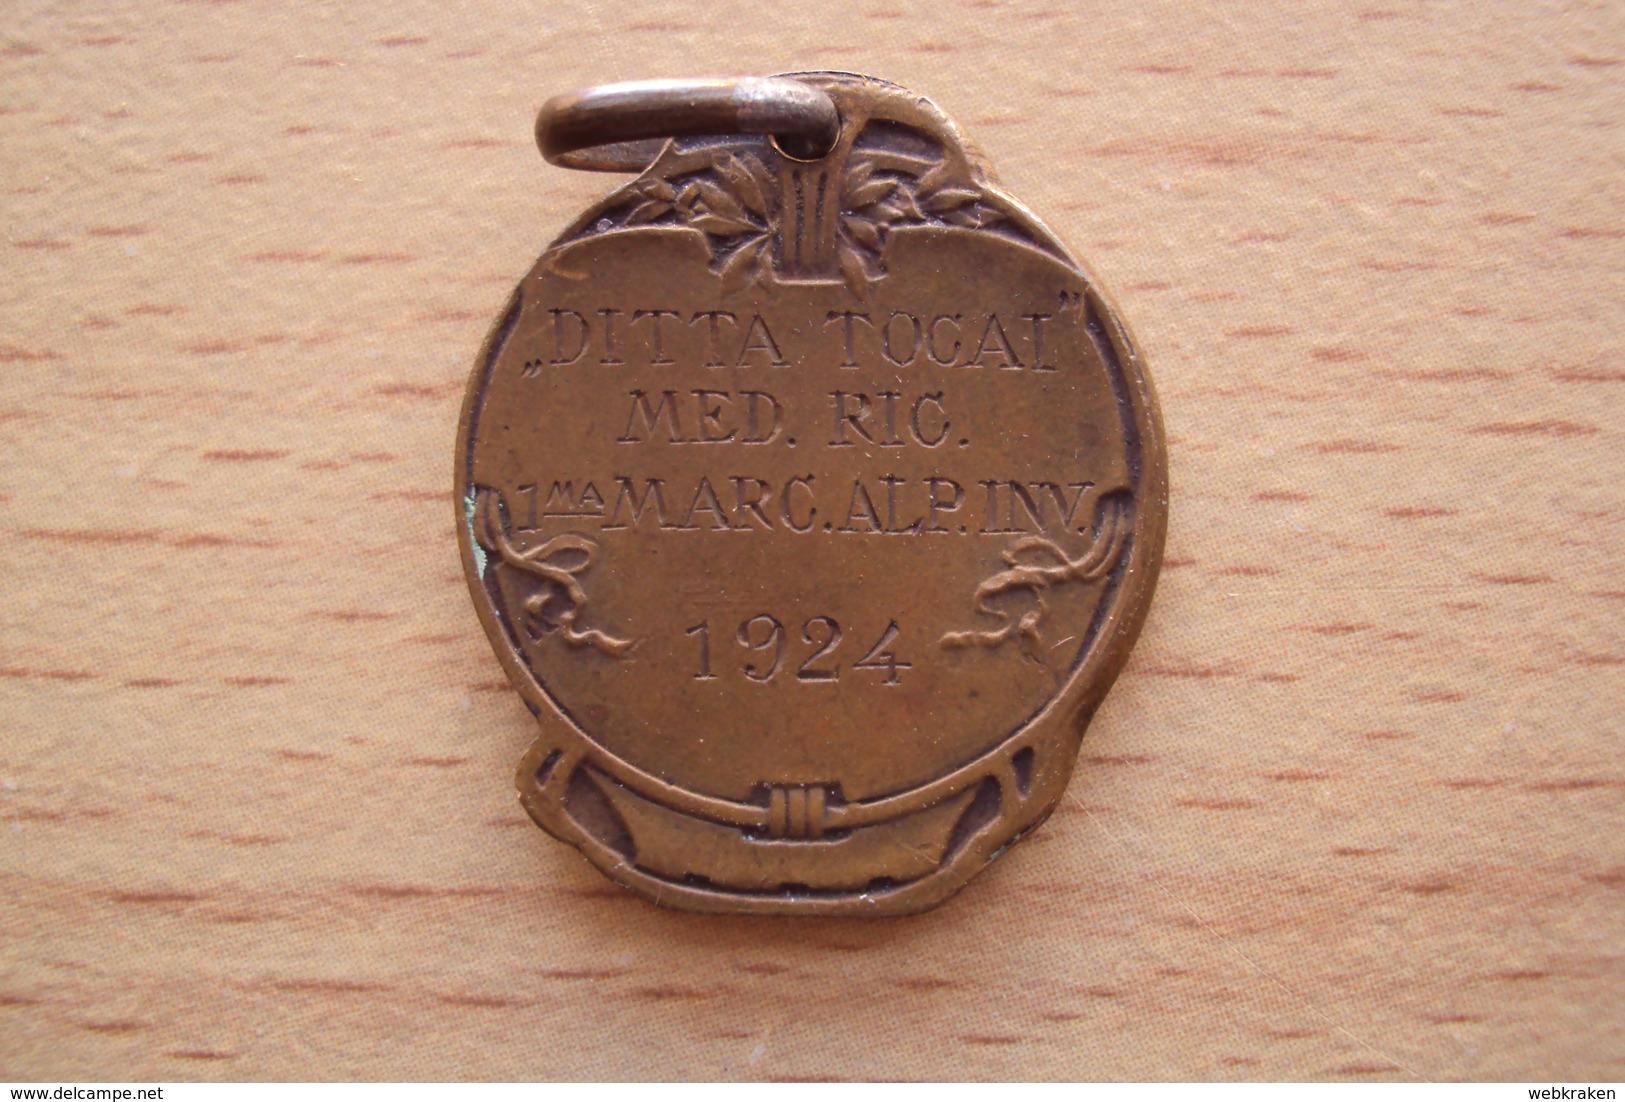 ITALY VINTAGE OLD MEDALS VECCHIA MEDAGLIA FRIULI VENEZIA GIULIA DITTA TOCAI 1a MARCIA ALPINA 1924  DIAMETRO CM. 2 - Italia